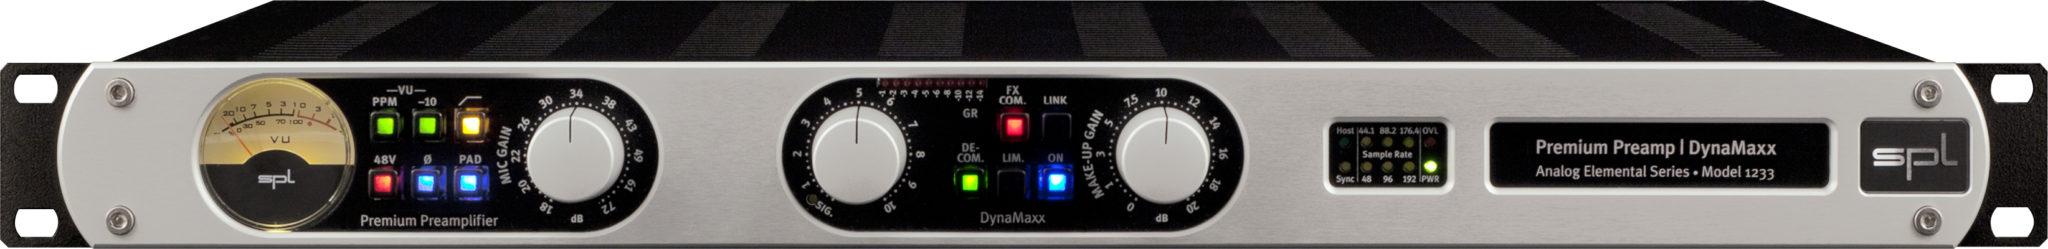 Premium_DynaMaxx_front_print